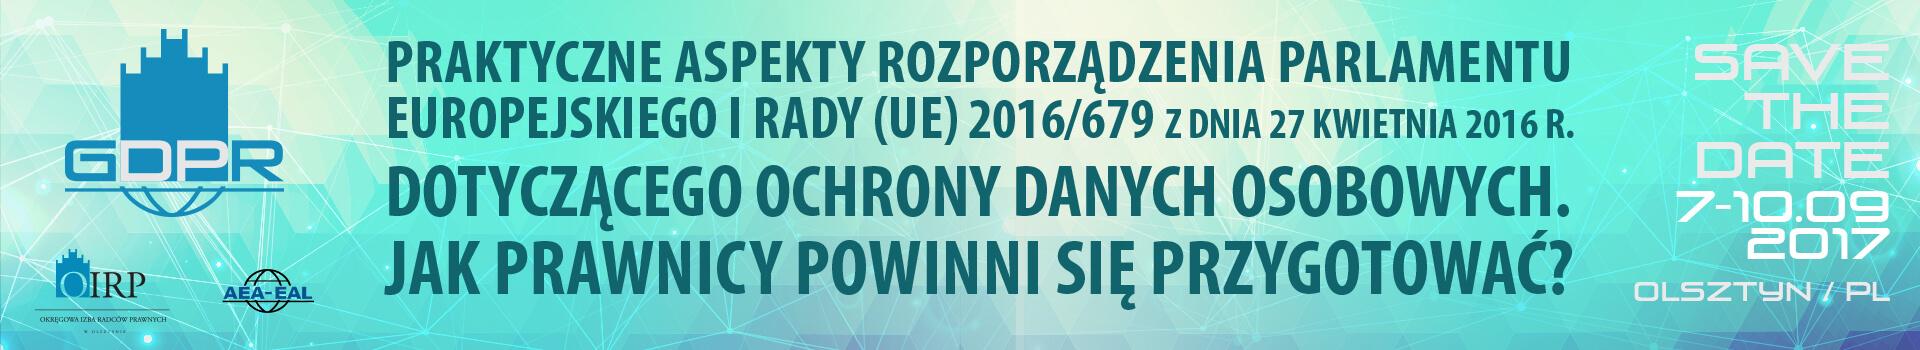 Konferencja GDPR 2017 Olsztyn